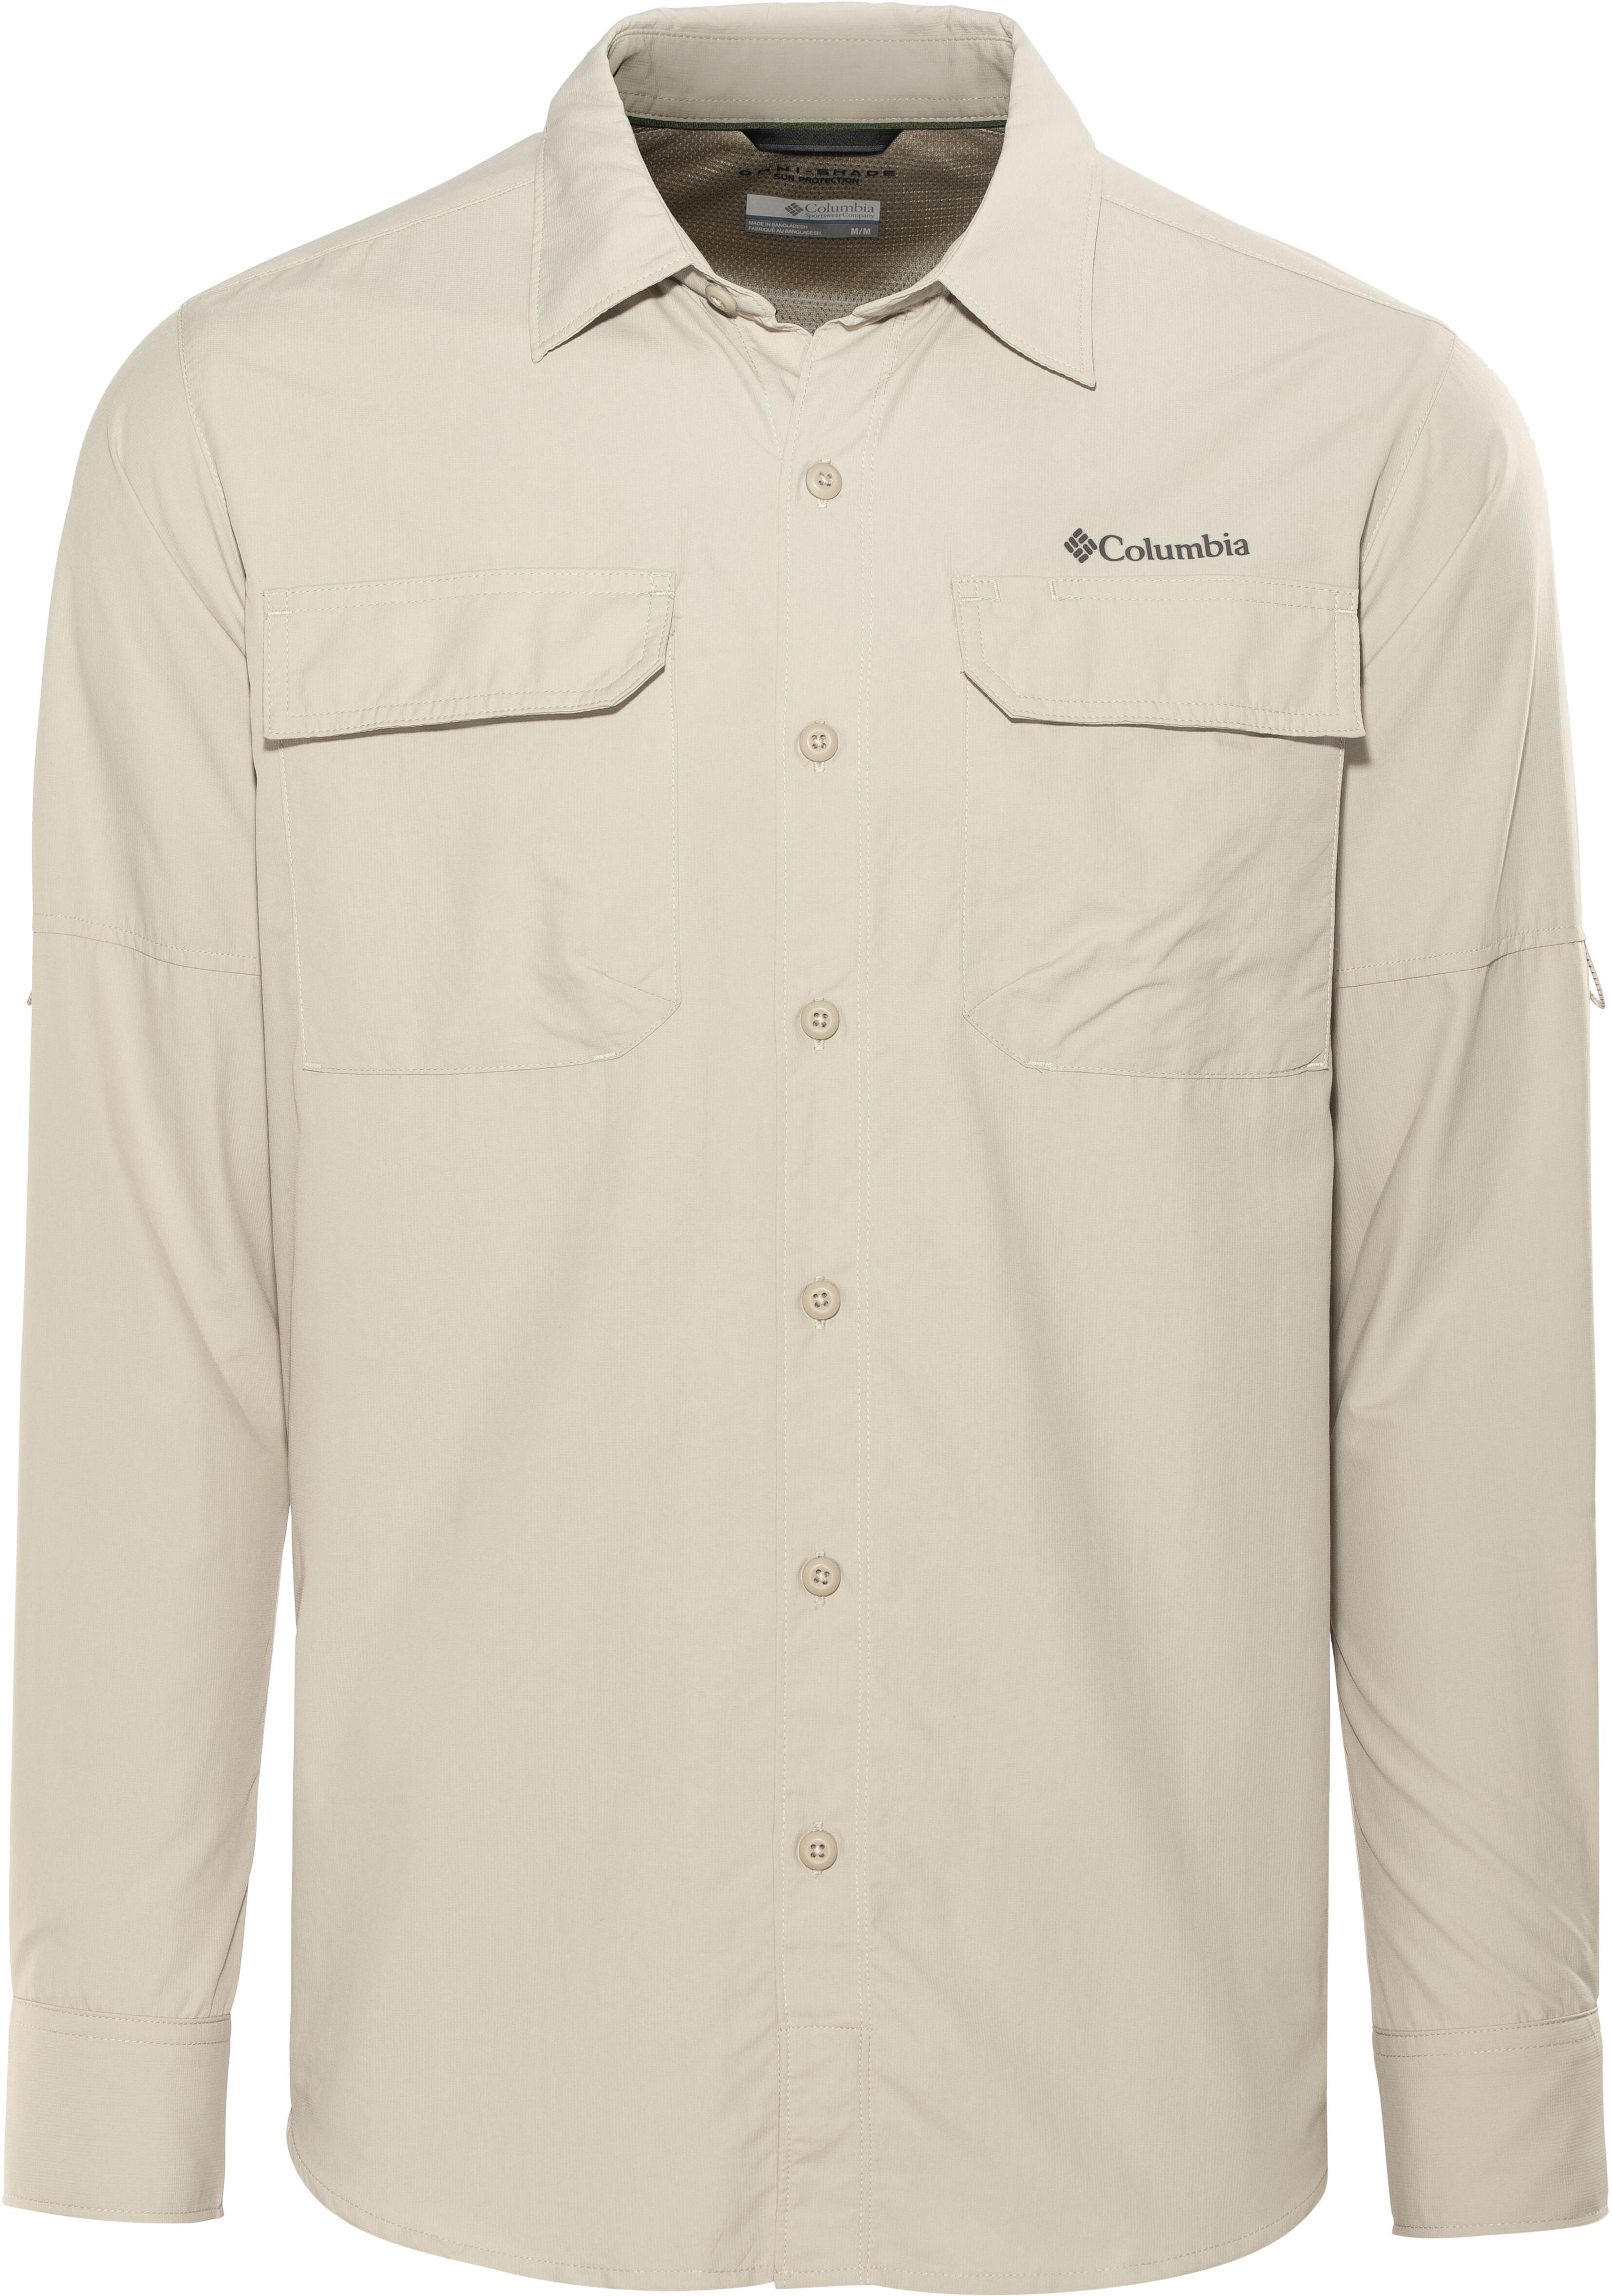 4bbab674ab5 Columbia Silver Ridge II - Camiseta de manga larga Hombre - beige ...